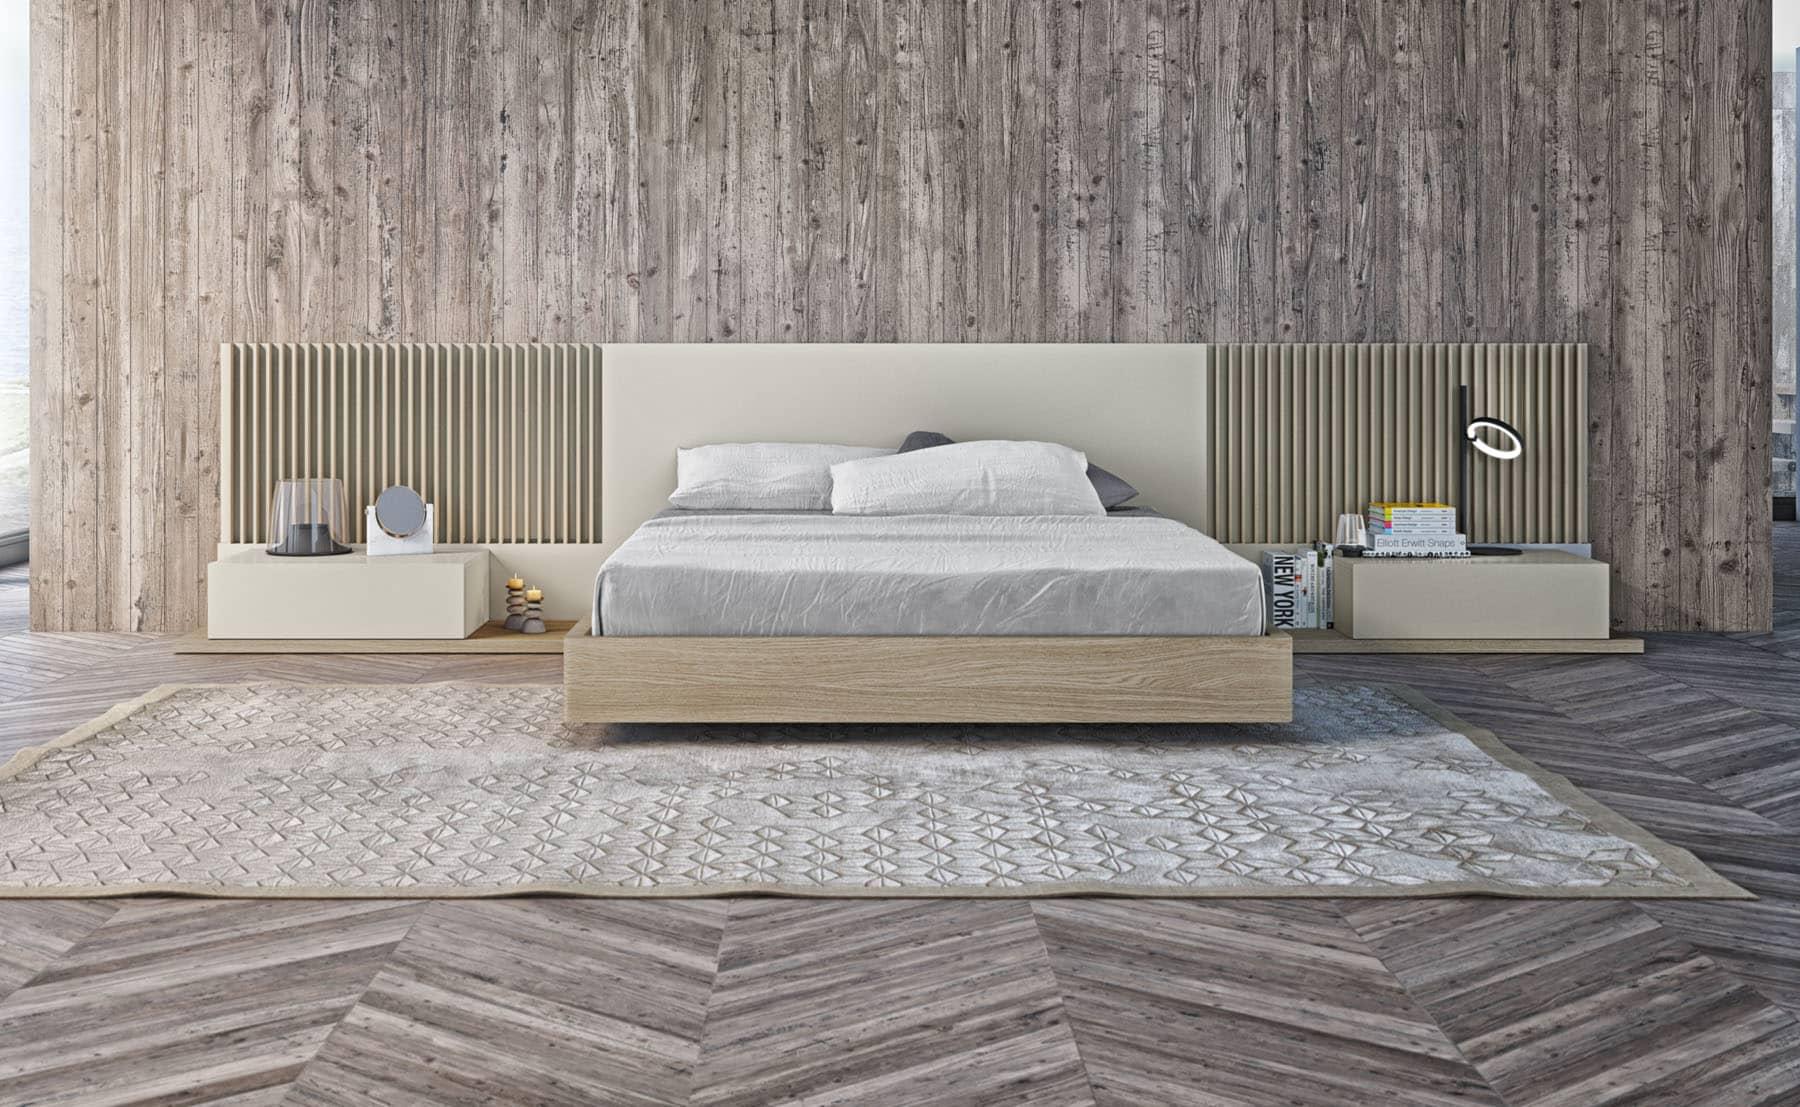 Tienda de muebles en zaragoza r stica ambientes - Lampadari stanza da letto ...